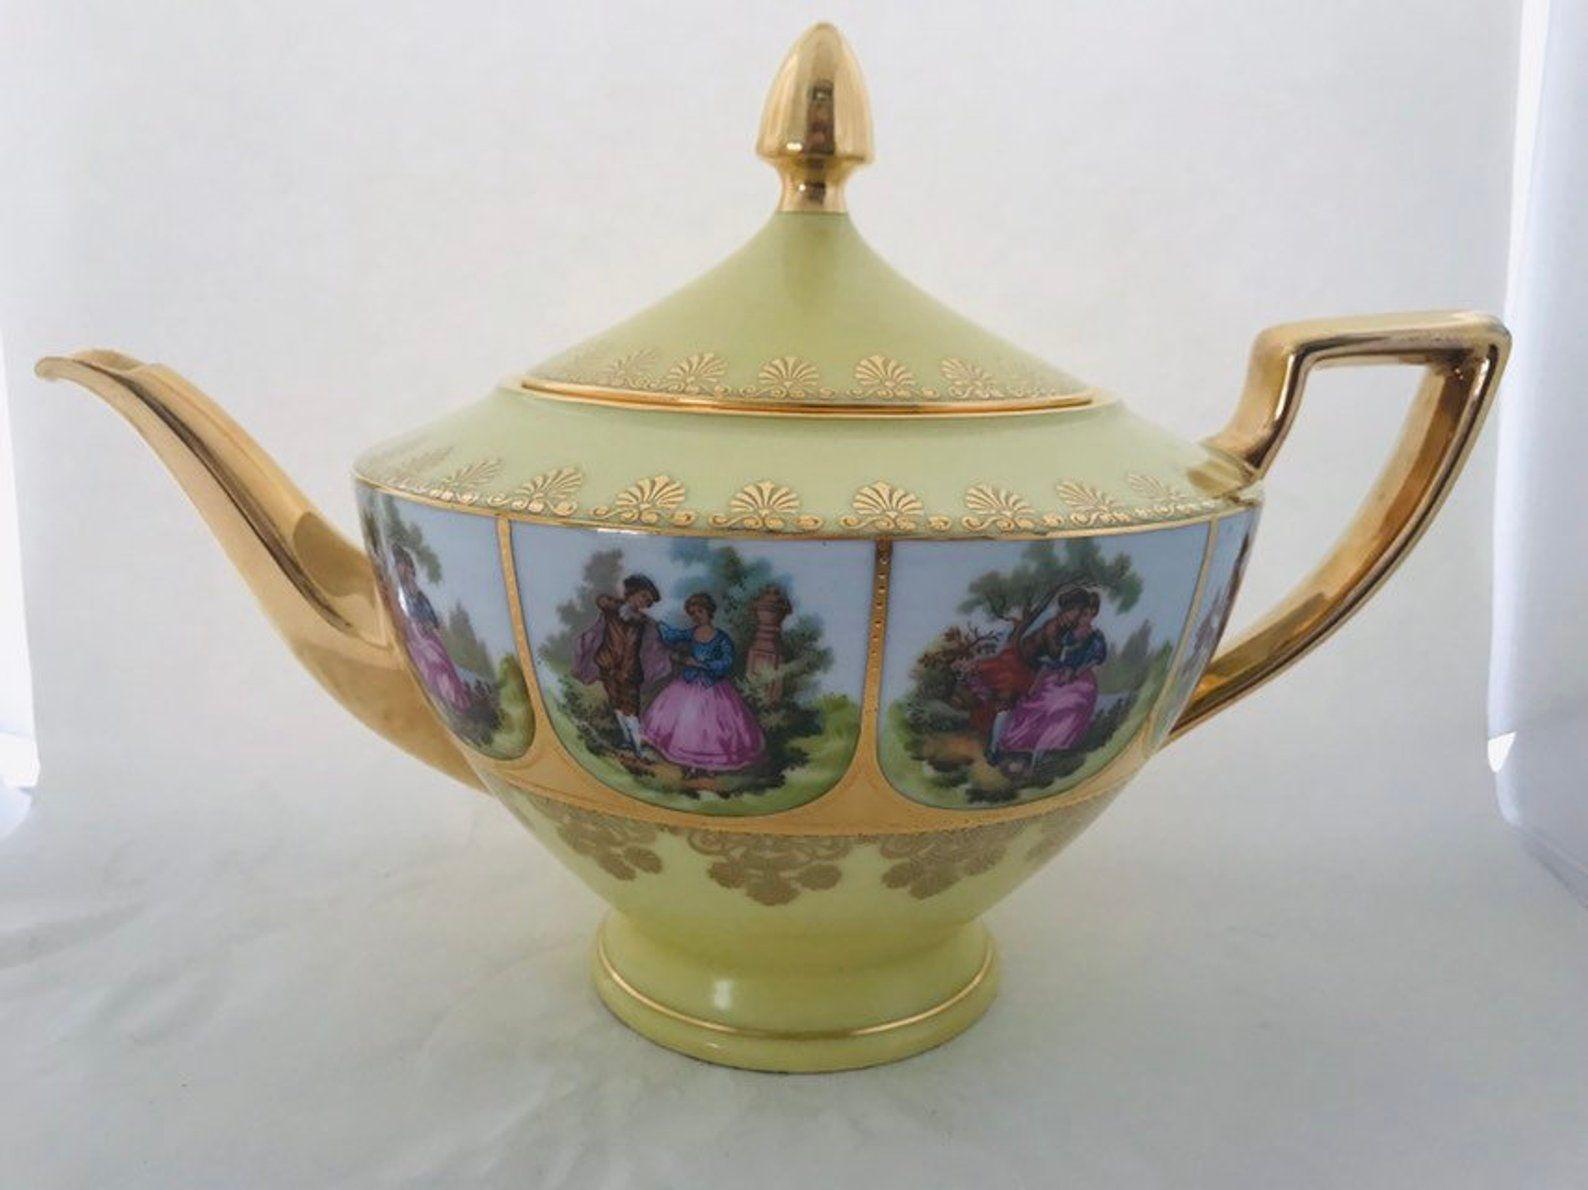 Vintage Fragonard German Teapot With Panels Depicting A Courting Couple Gilt German Bone China Teapot Circa 1940 Tea Pots Bone China Teapots How To Make Tea